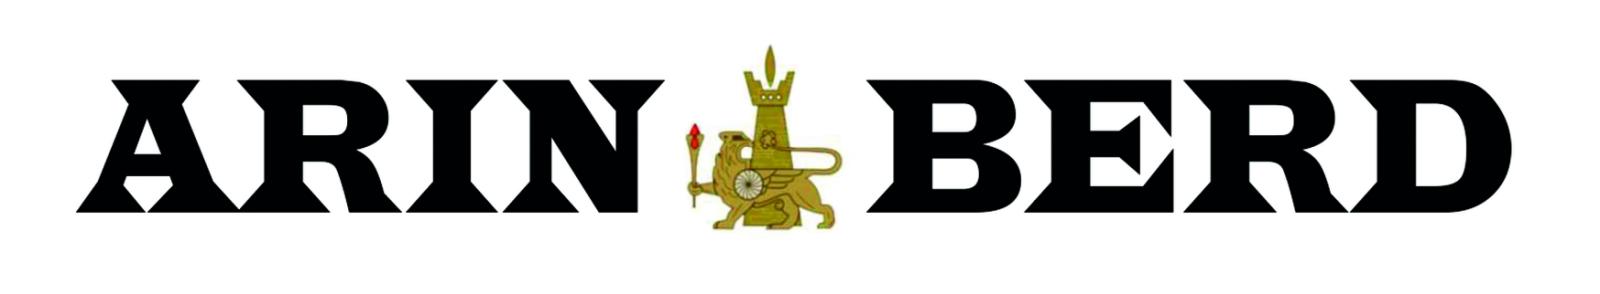 логотип arinberd